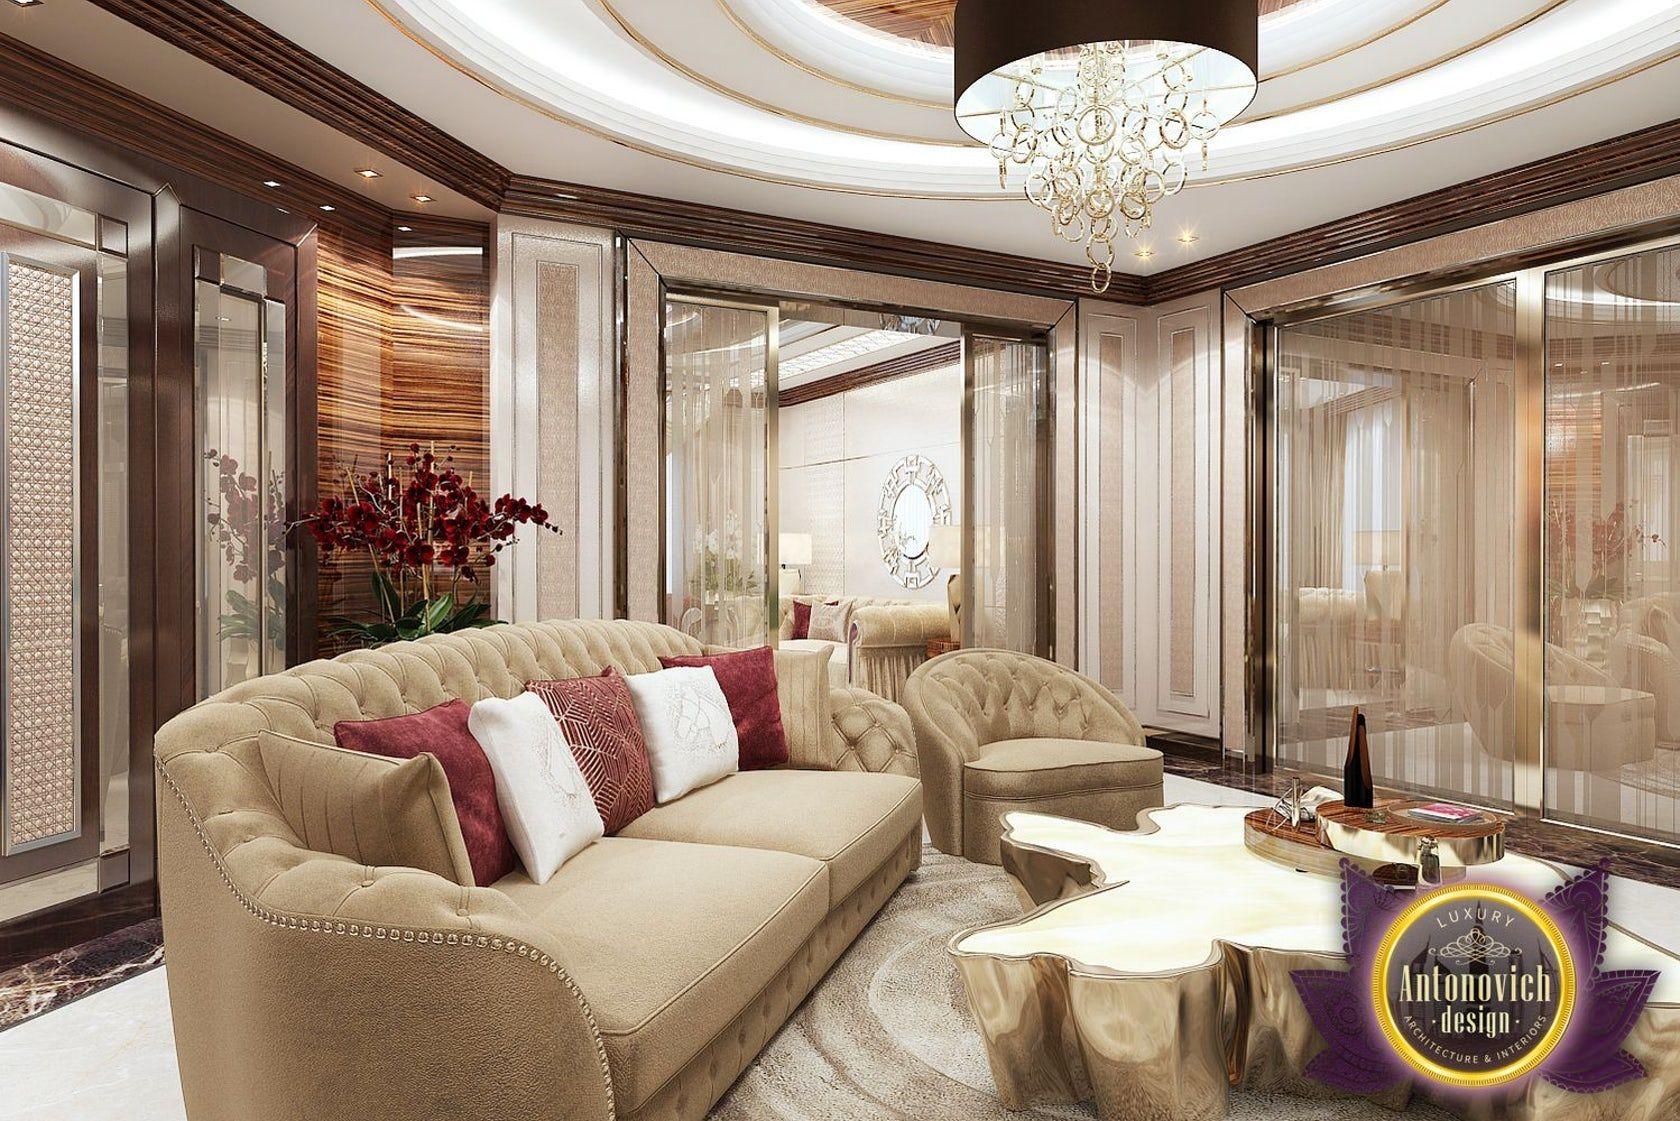 Furniture Design For Living Room In Nigeria Furniture Design Living Room Interior Decorating Living Room Interior Room Decoration